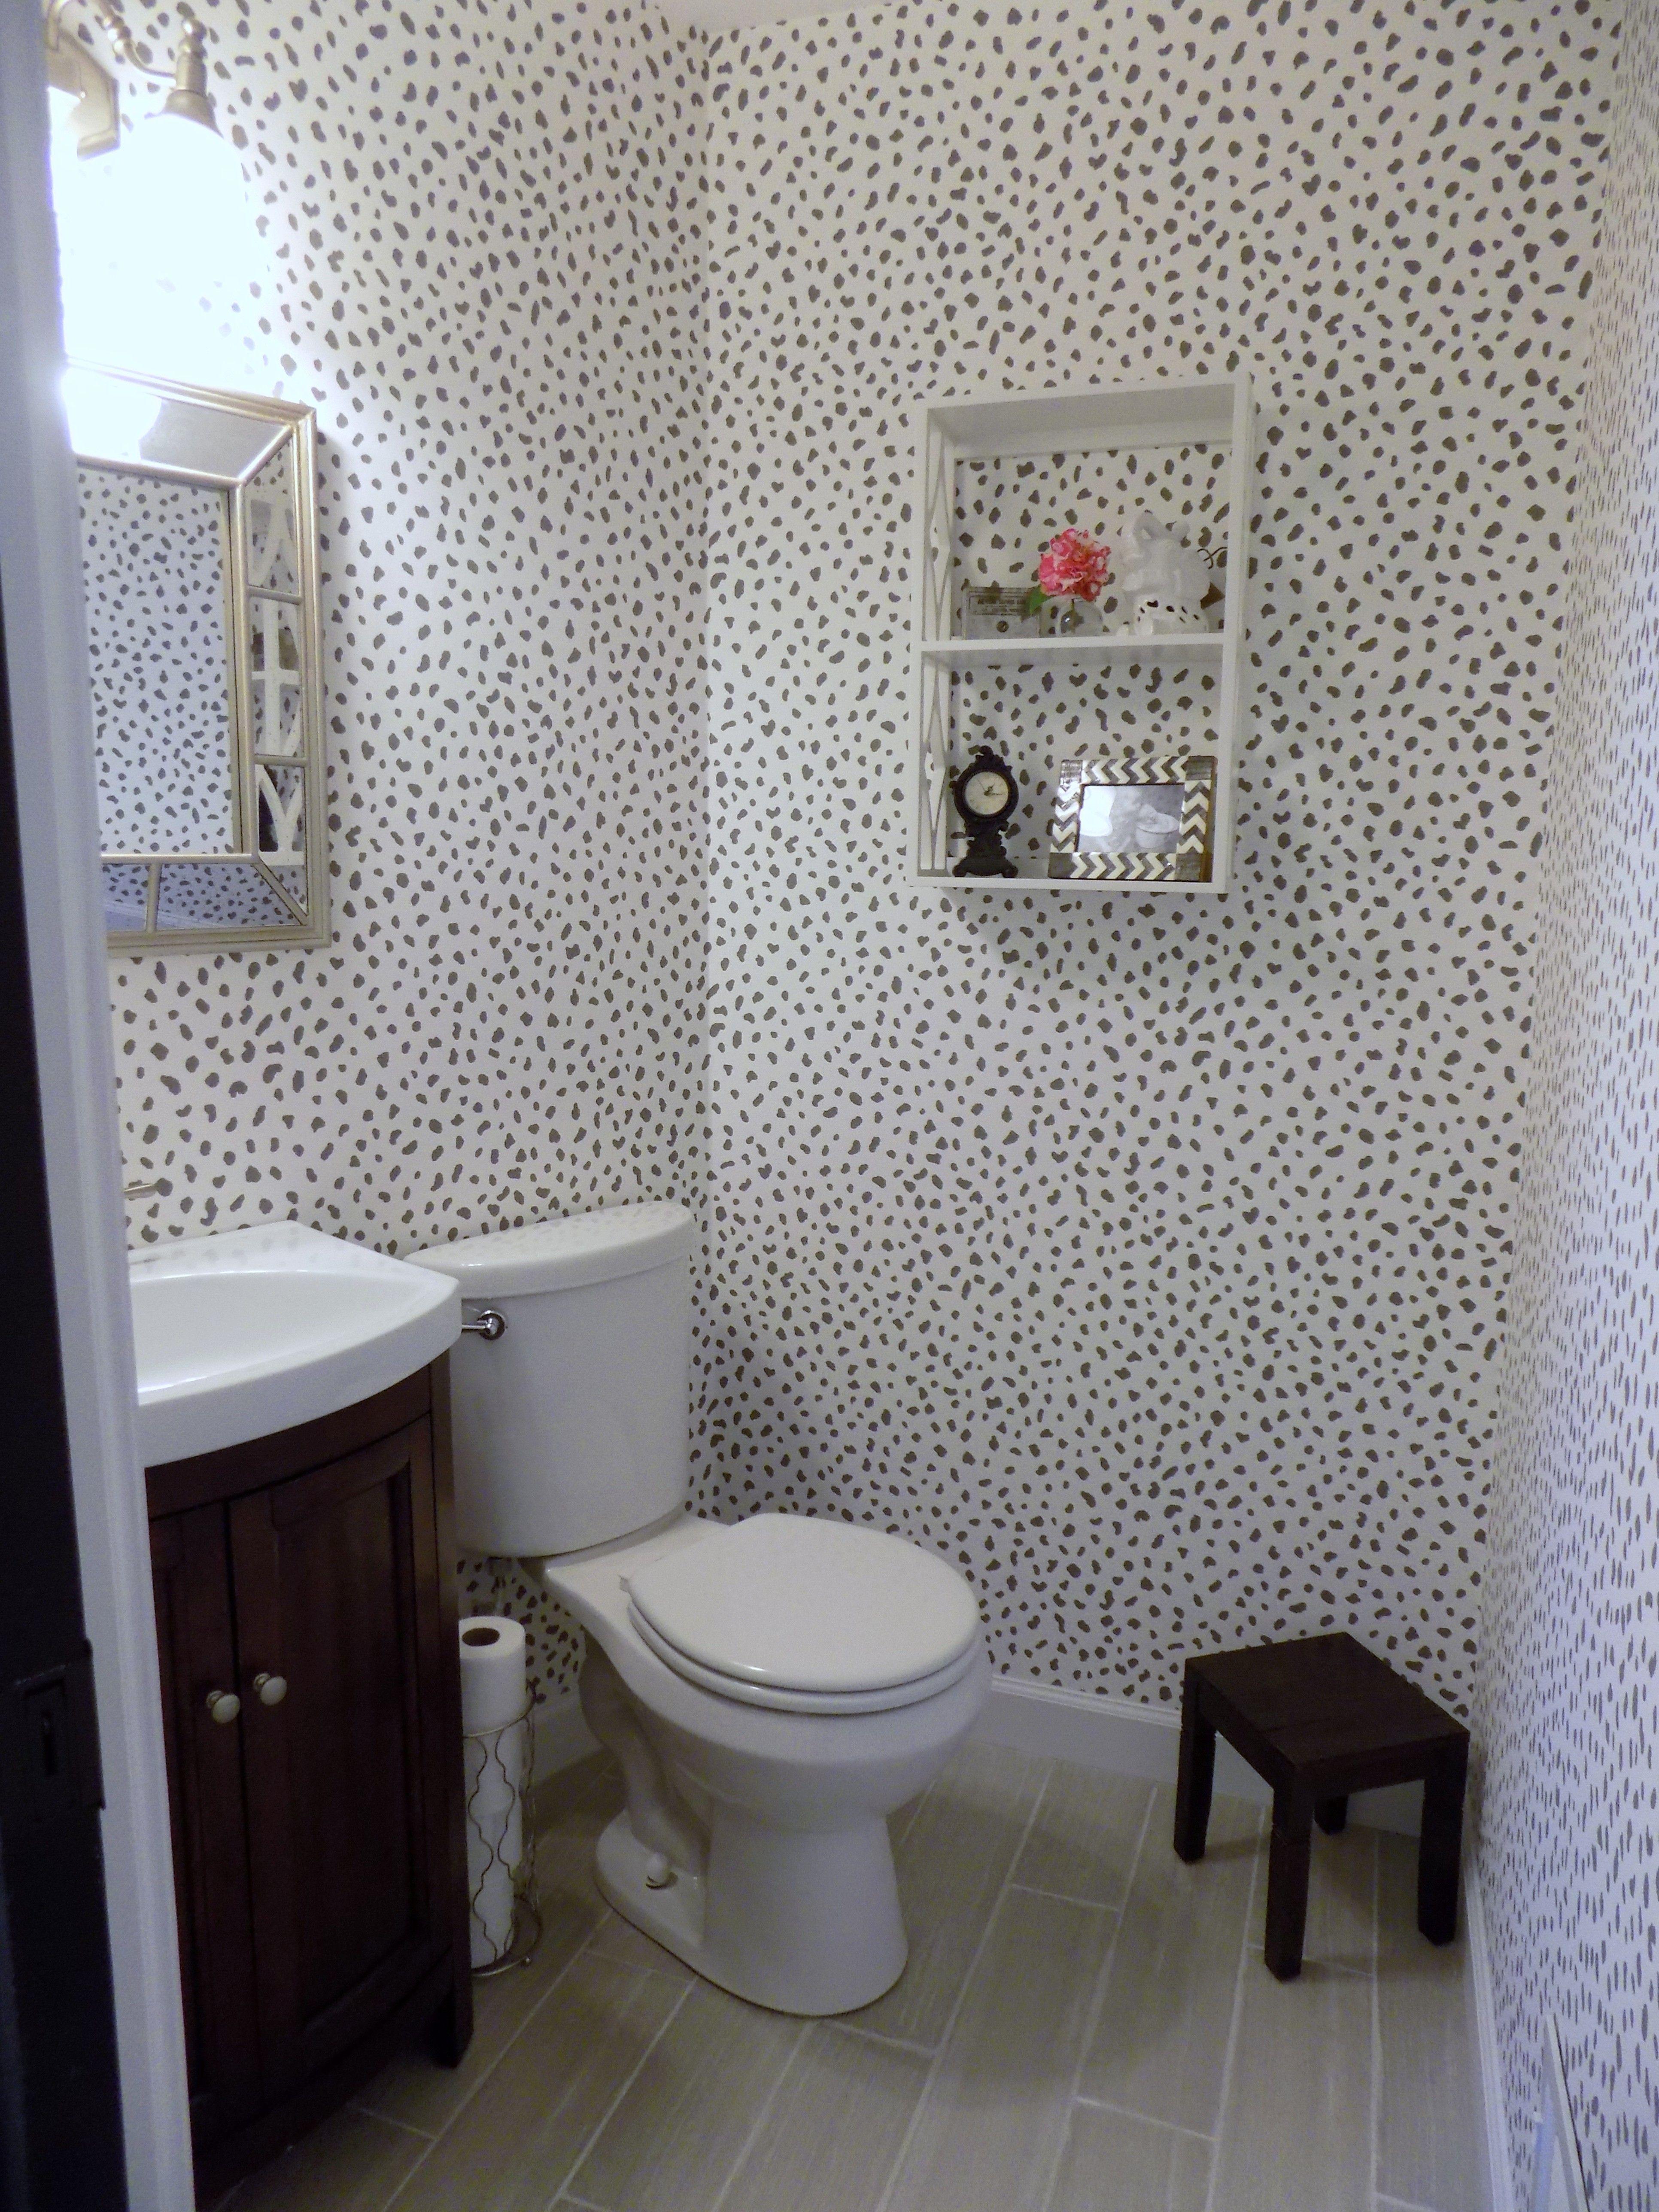 Powder Room Reveal Thibaut Tanzania wall paper Pottery Barn